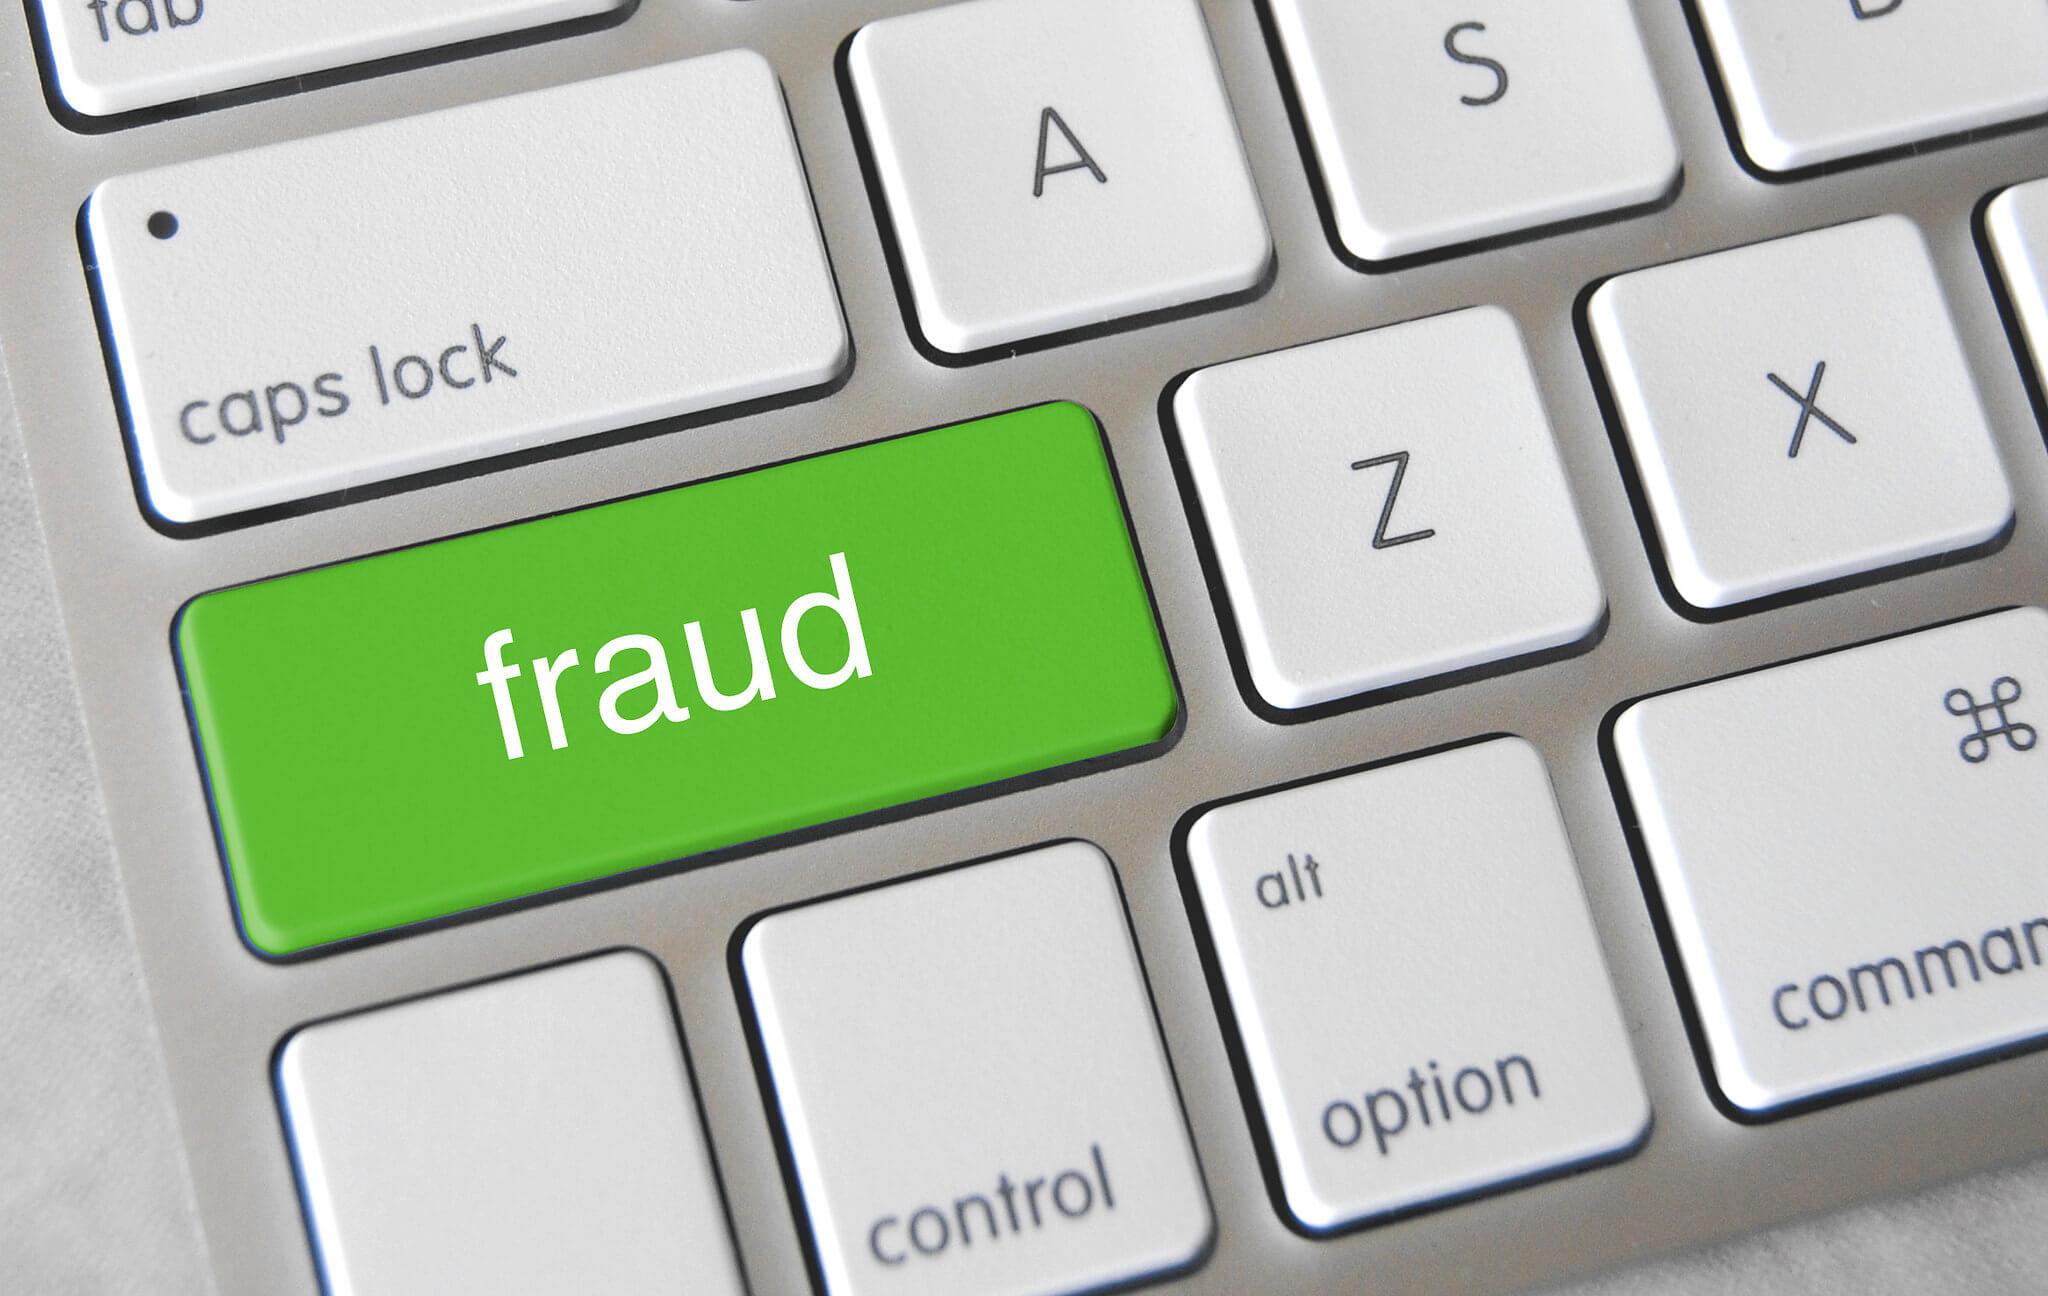 fraud key on laptop